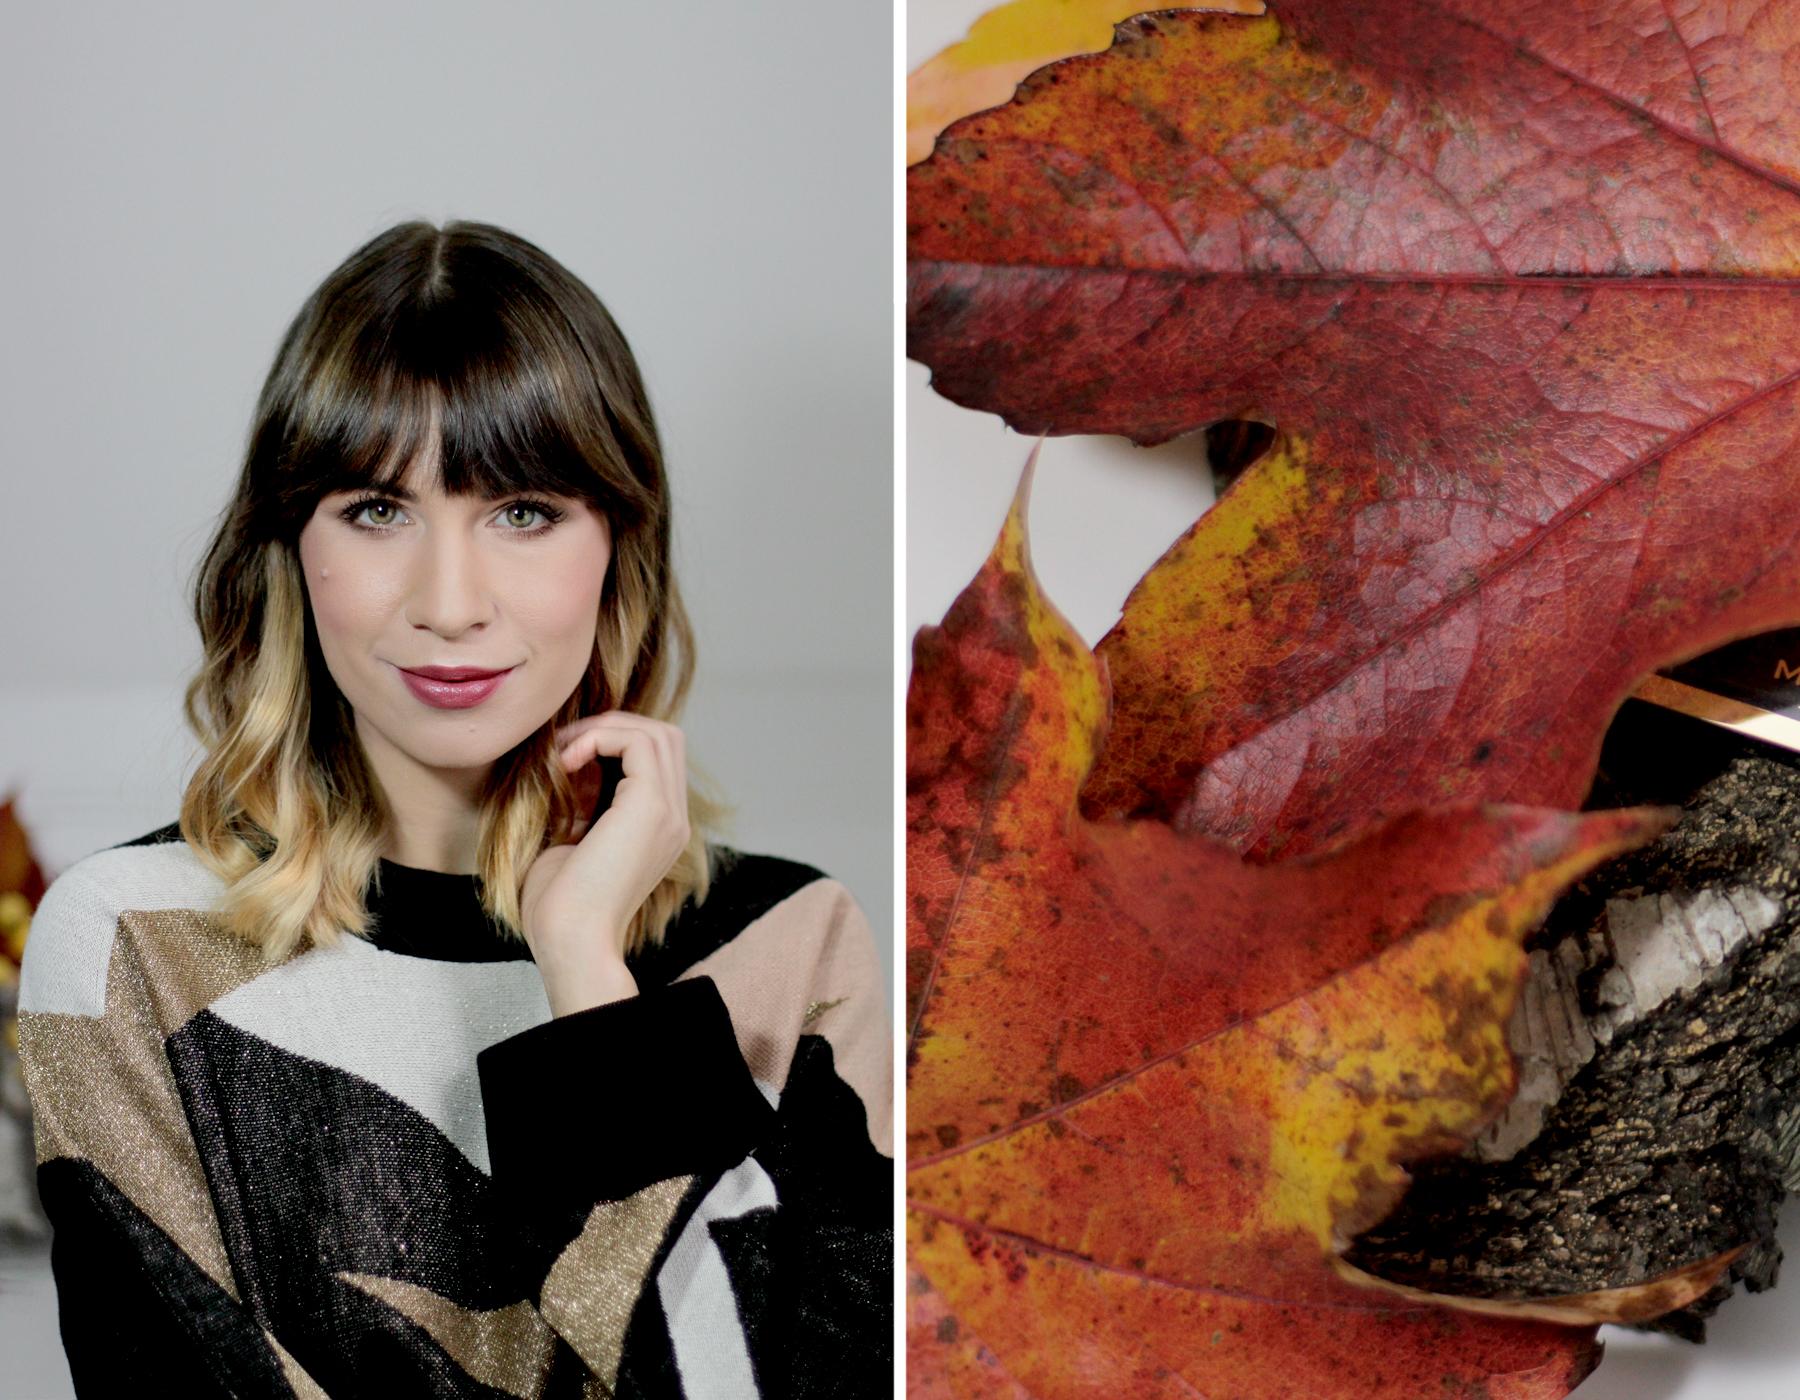 max factor autumn make up gold edition melanie schoene glow skin beauty beautyblogger germany düsseldorf berlin hannover ricarda schernus fashionblogger cats & dogs modeblog 5